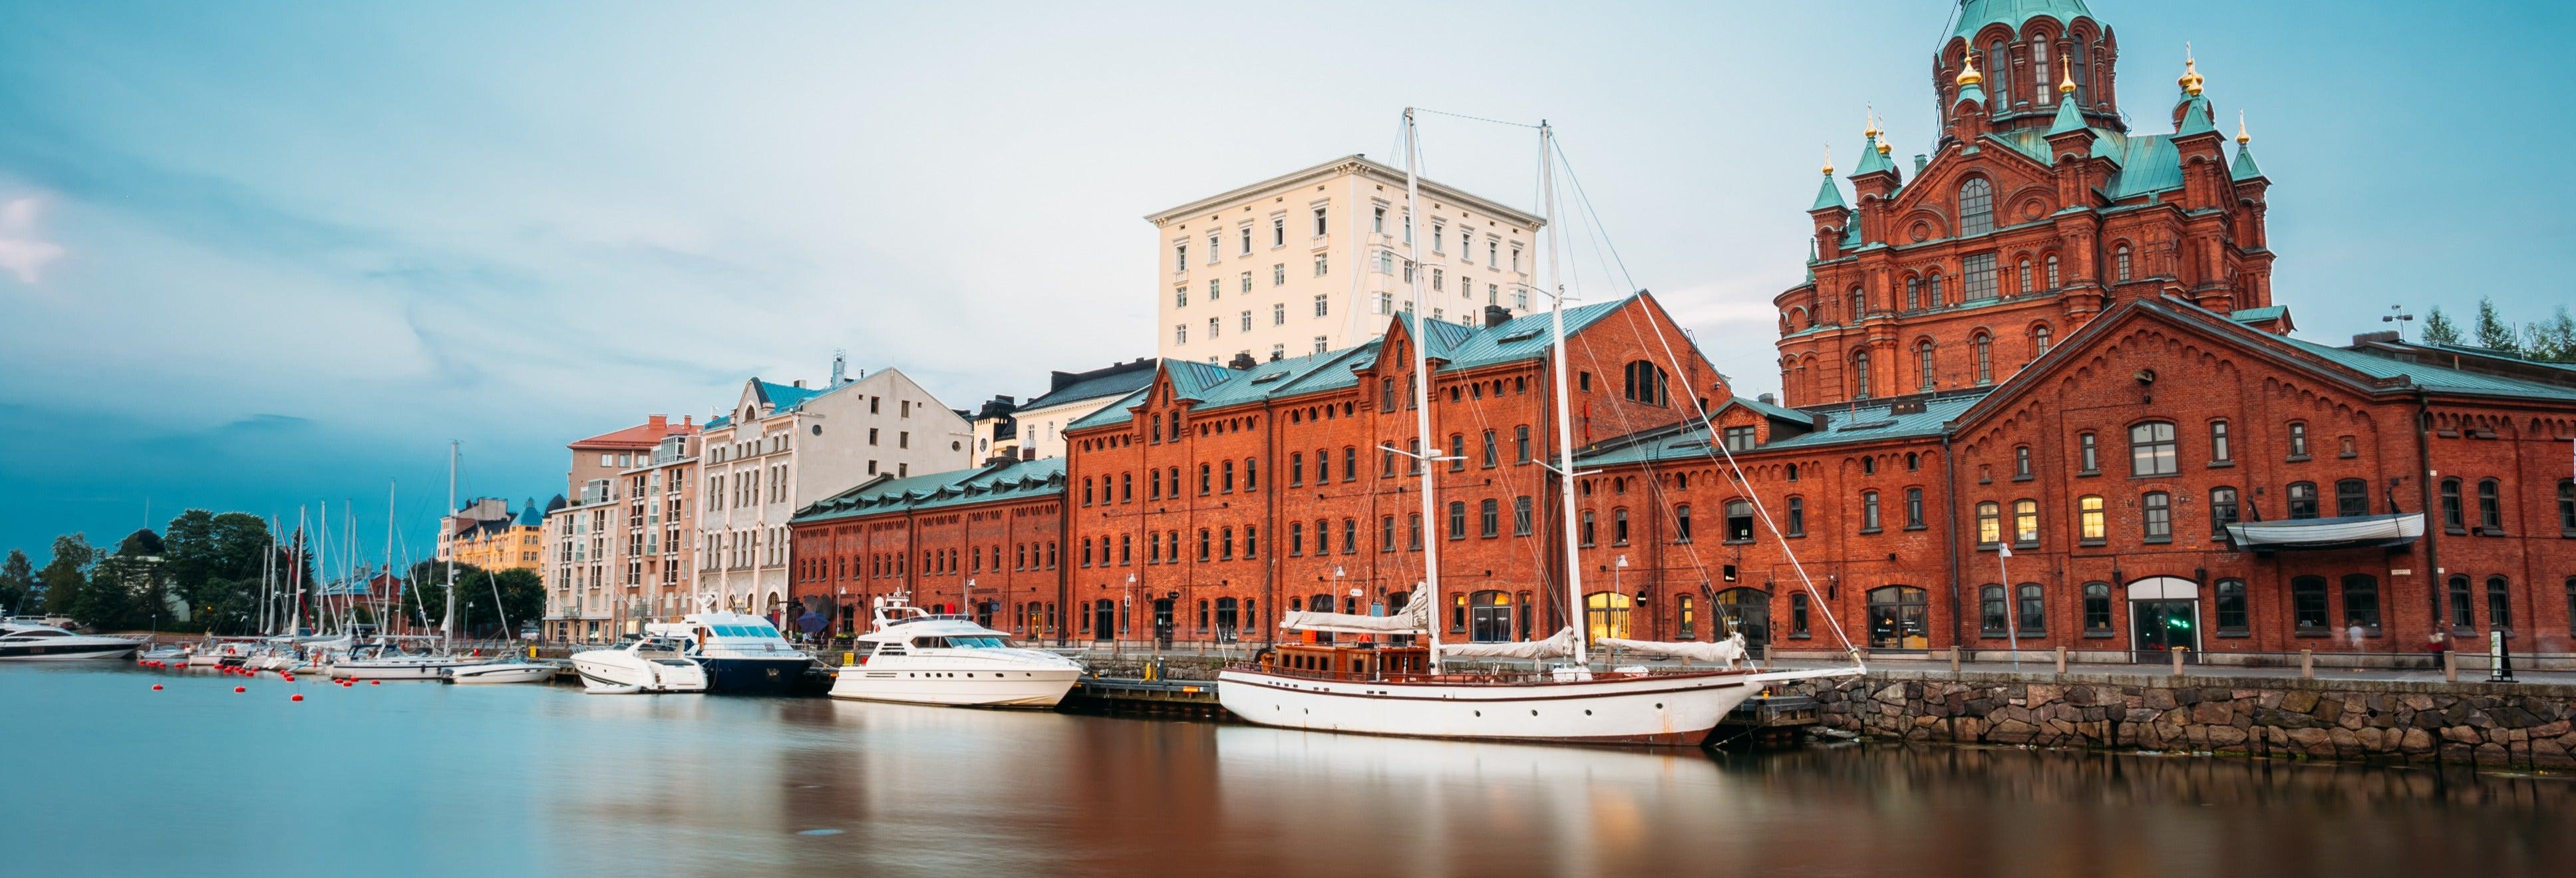 Tour privado por Helsinki con guía en español